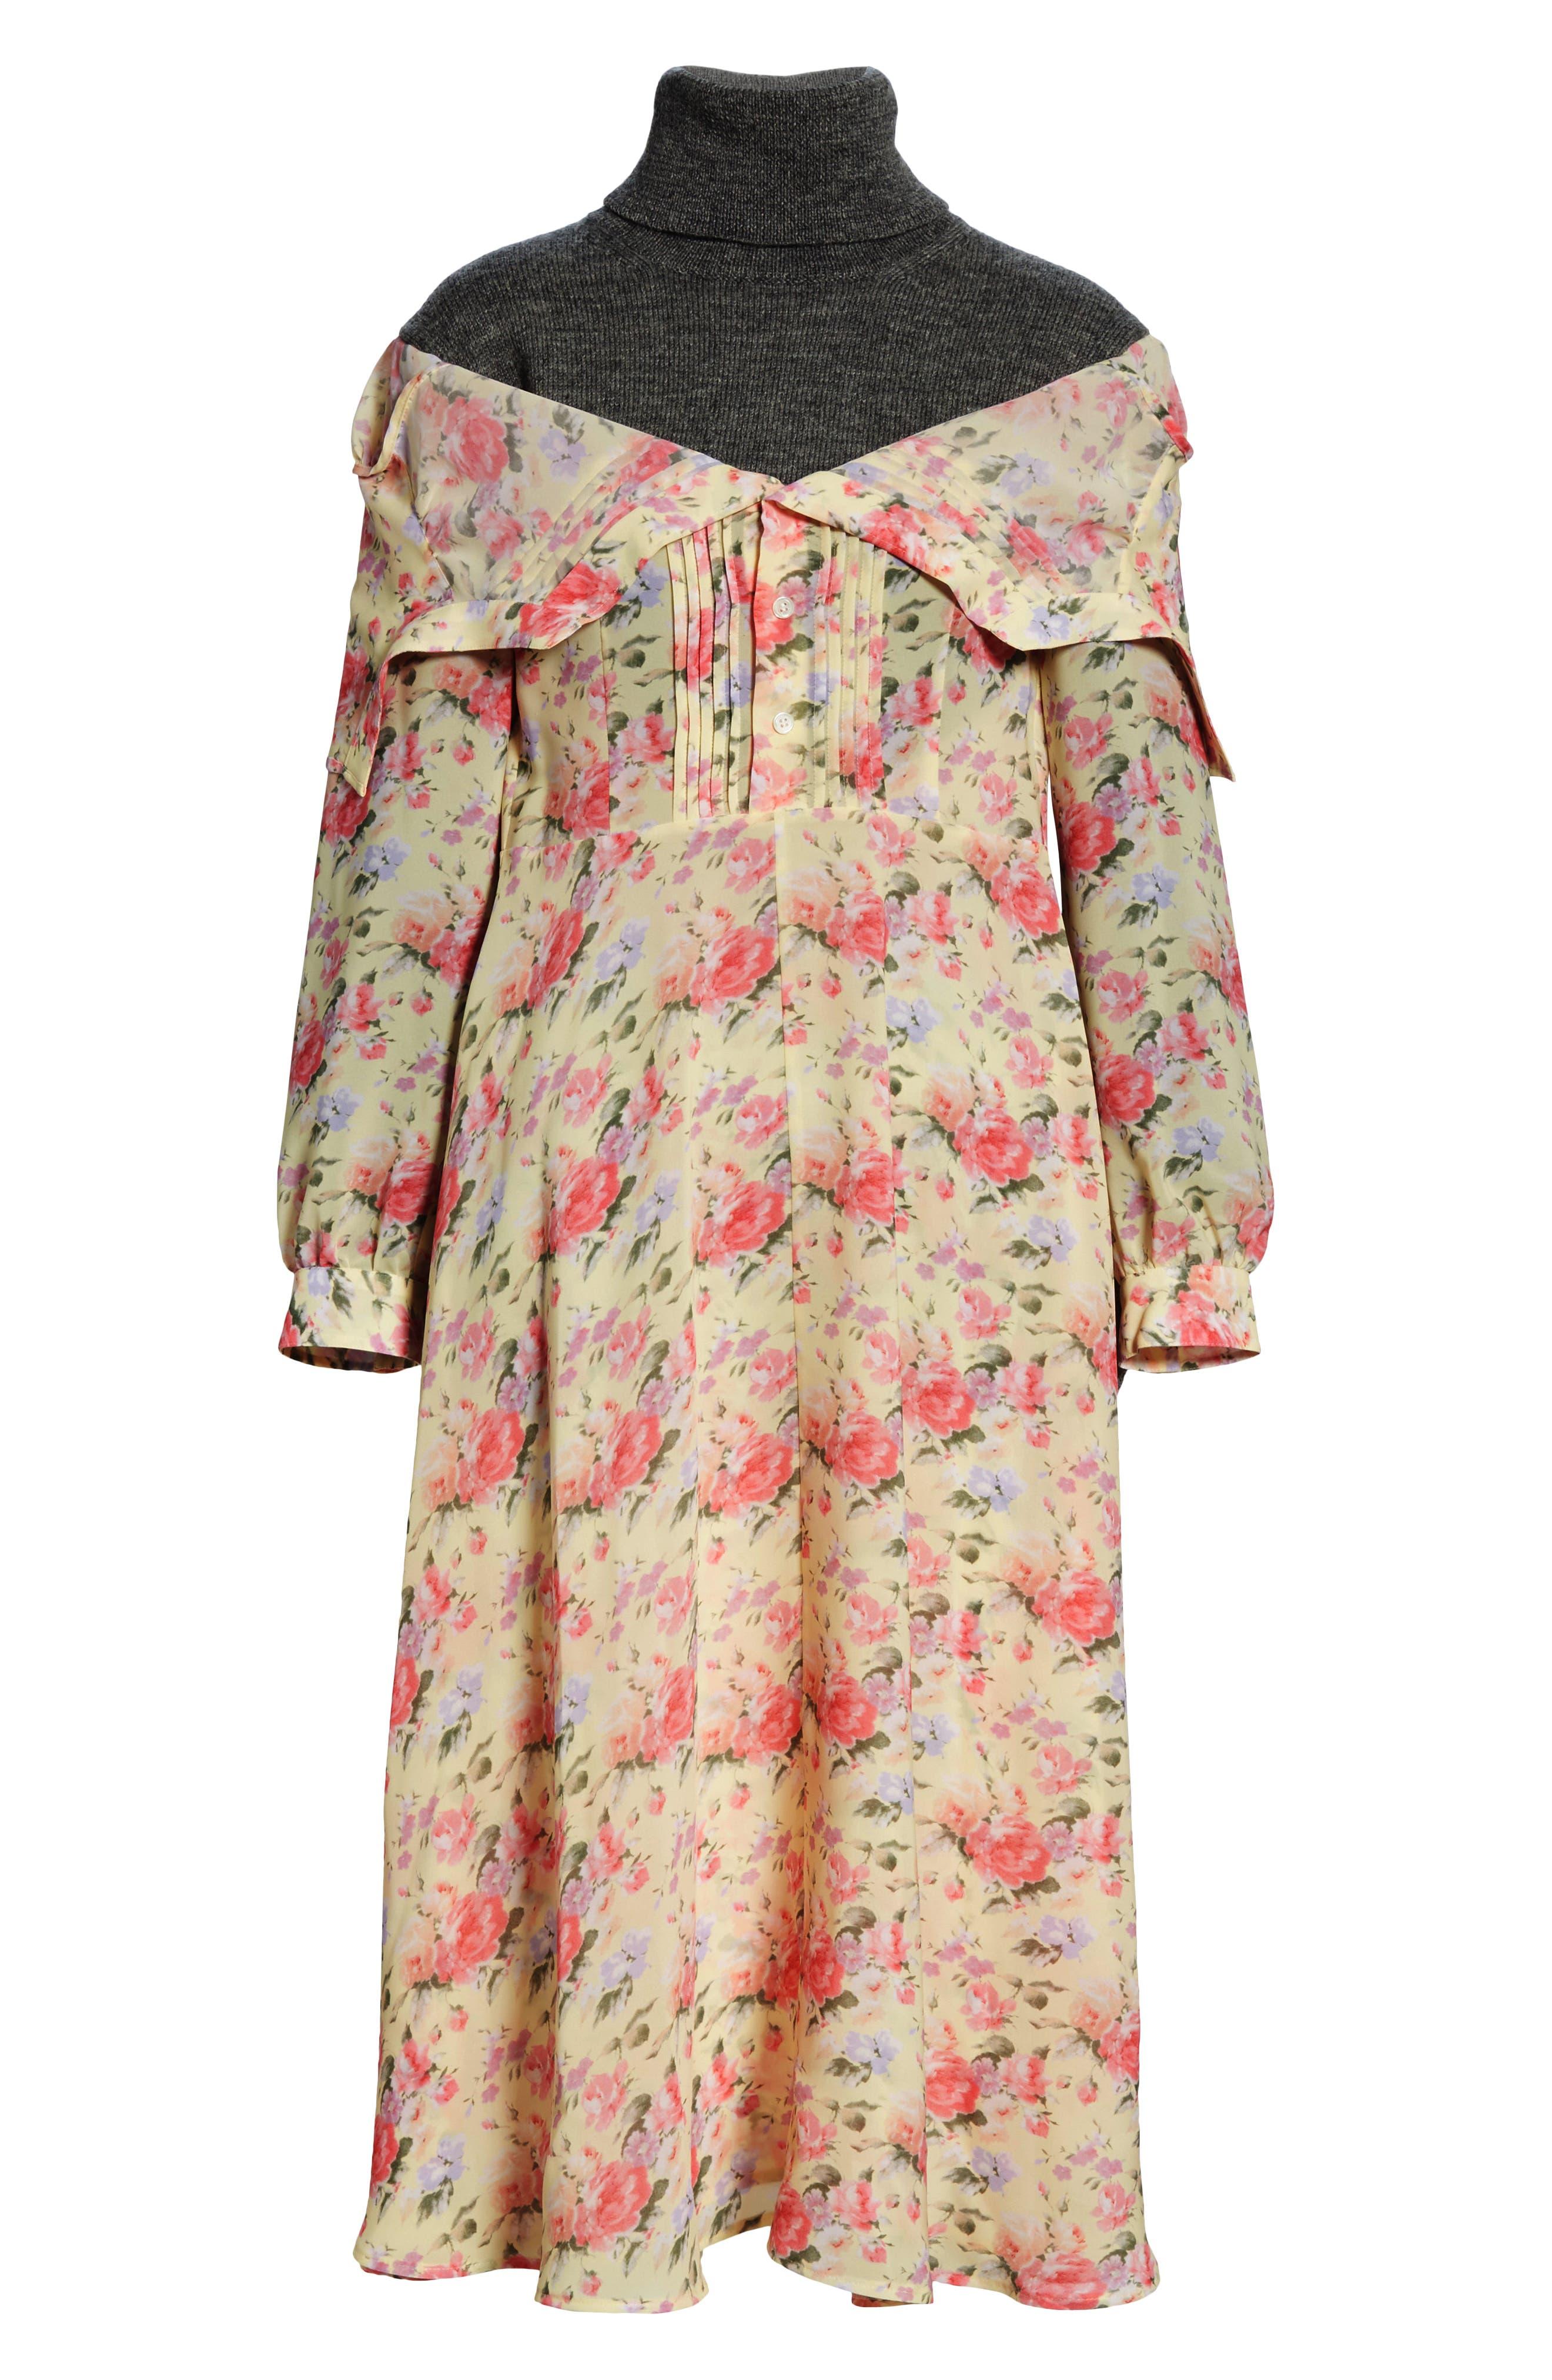 Mixed Media Floral Turtleneck Dress,                             Alternate thumbnail 7, color,                             YELLOW/ PINK/ PPL/ GREY